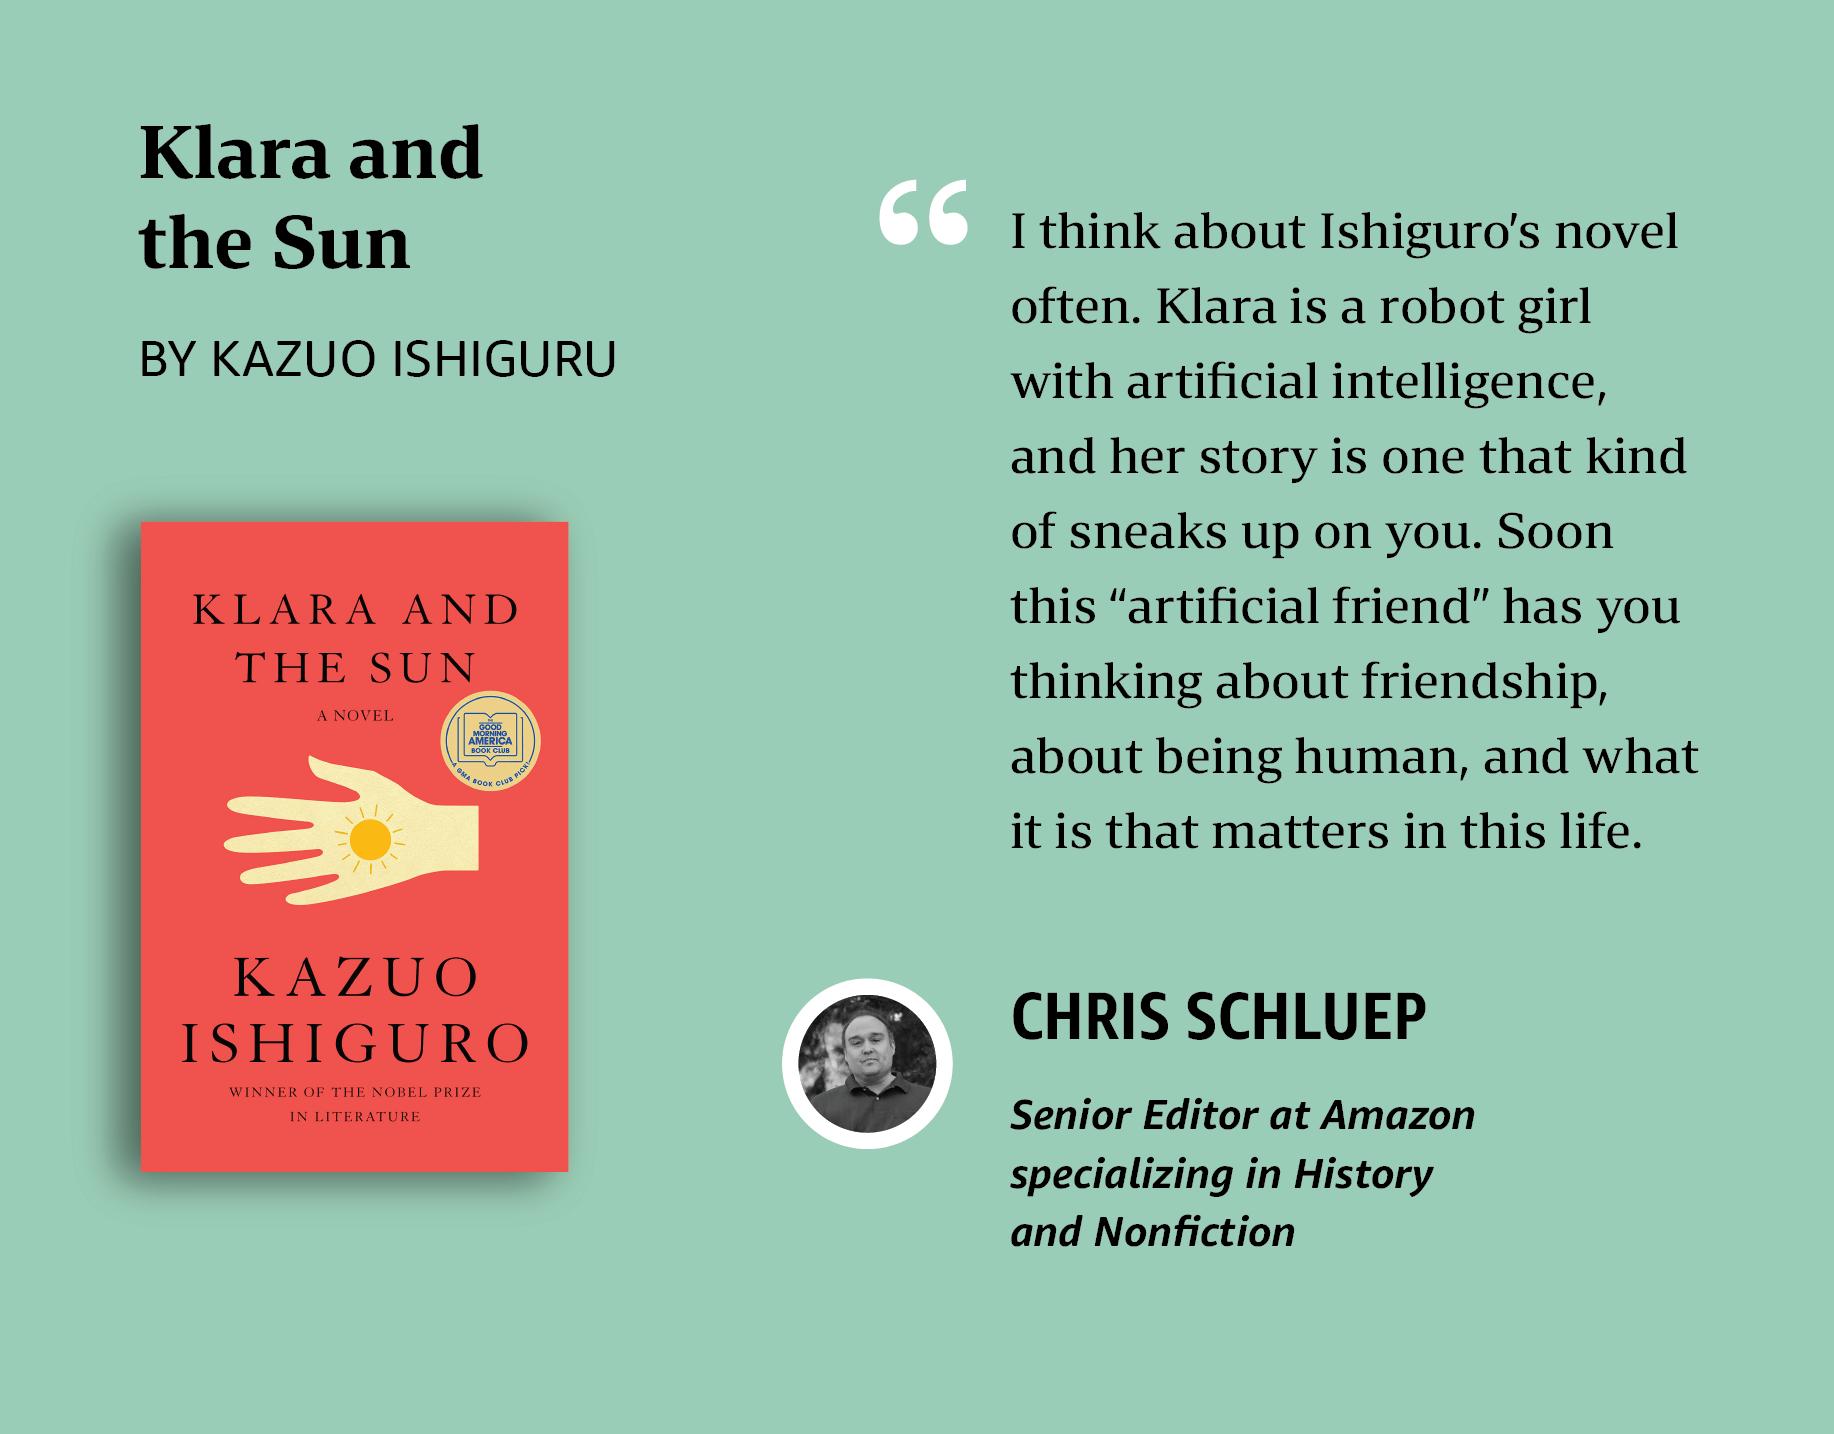 Chris's pick: Klara and the Sun